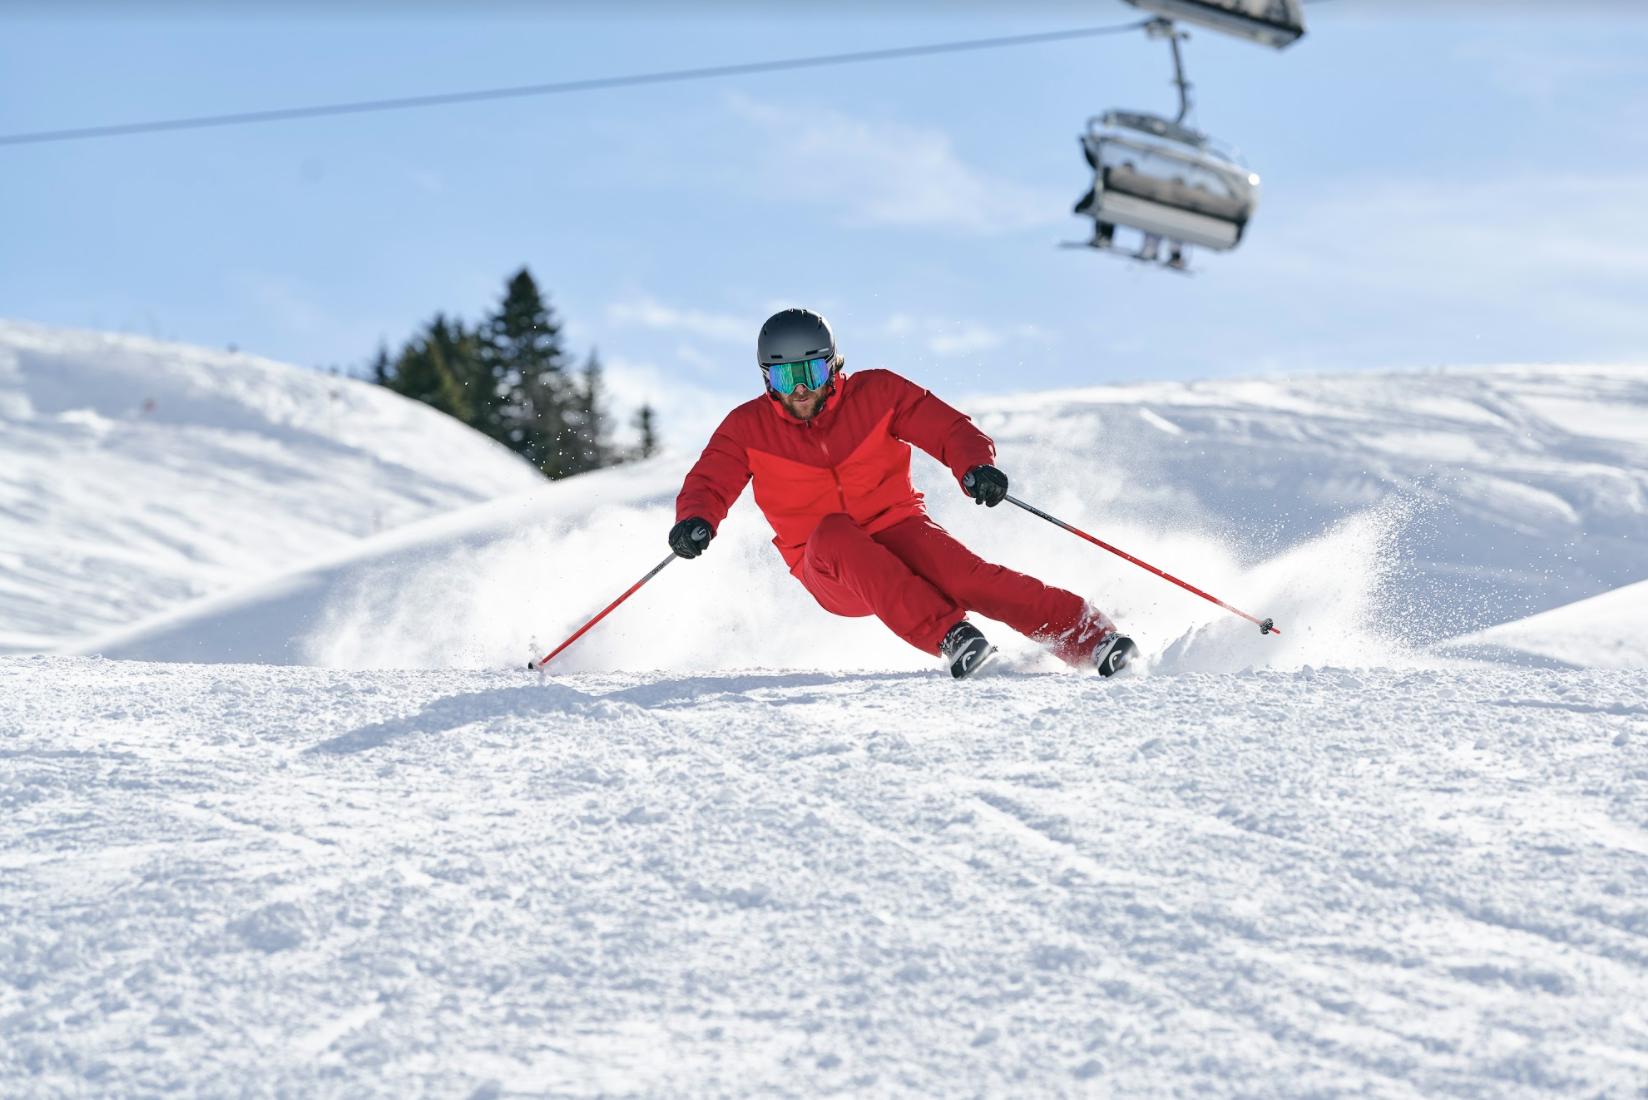 Pre Ski Season Conditioning